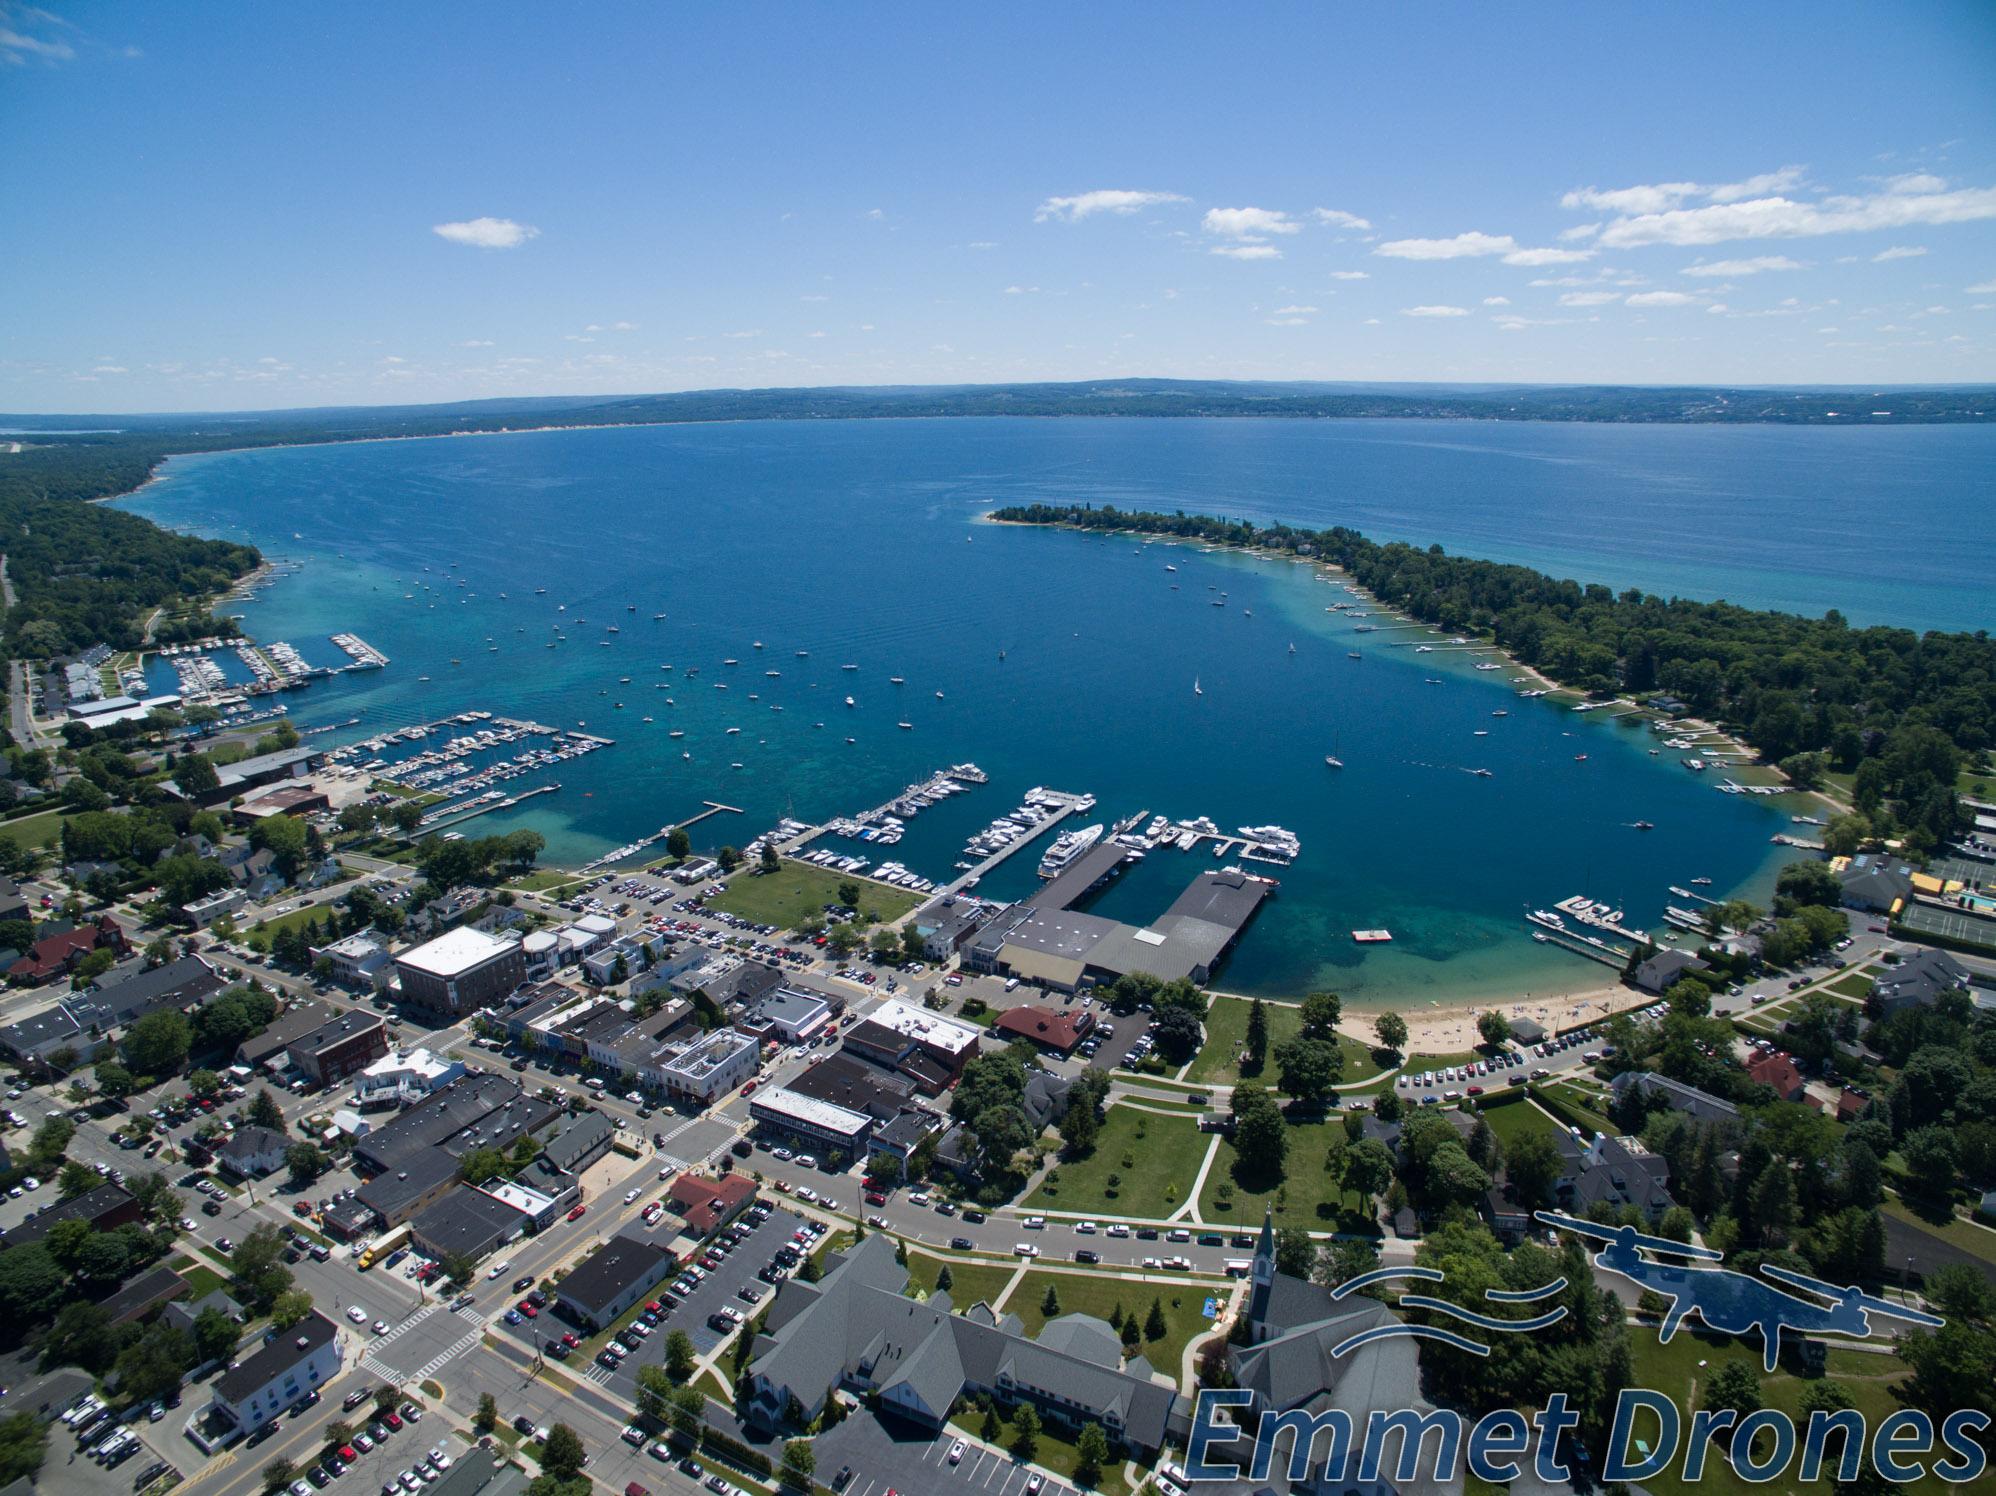 Harbor Springs Drone